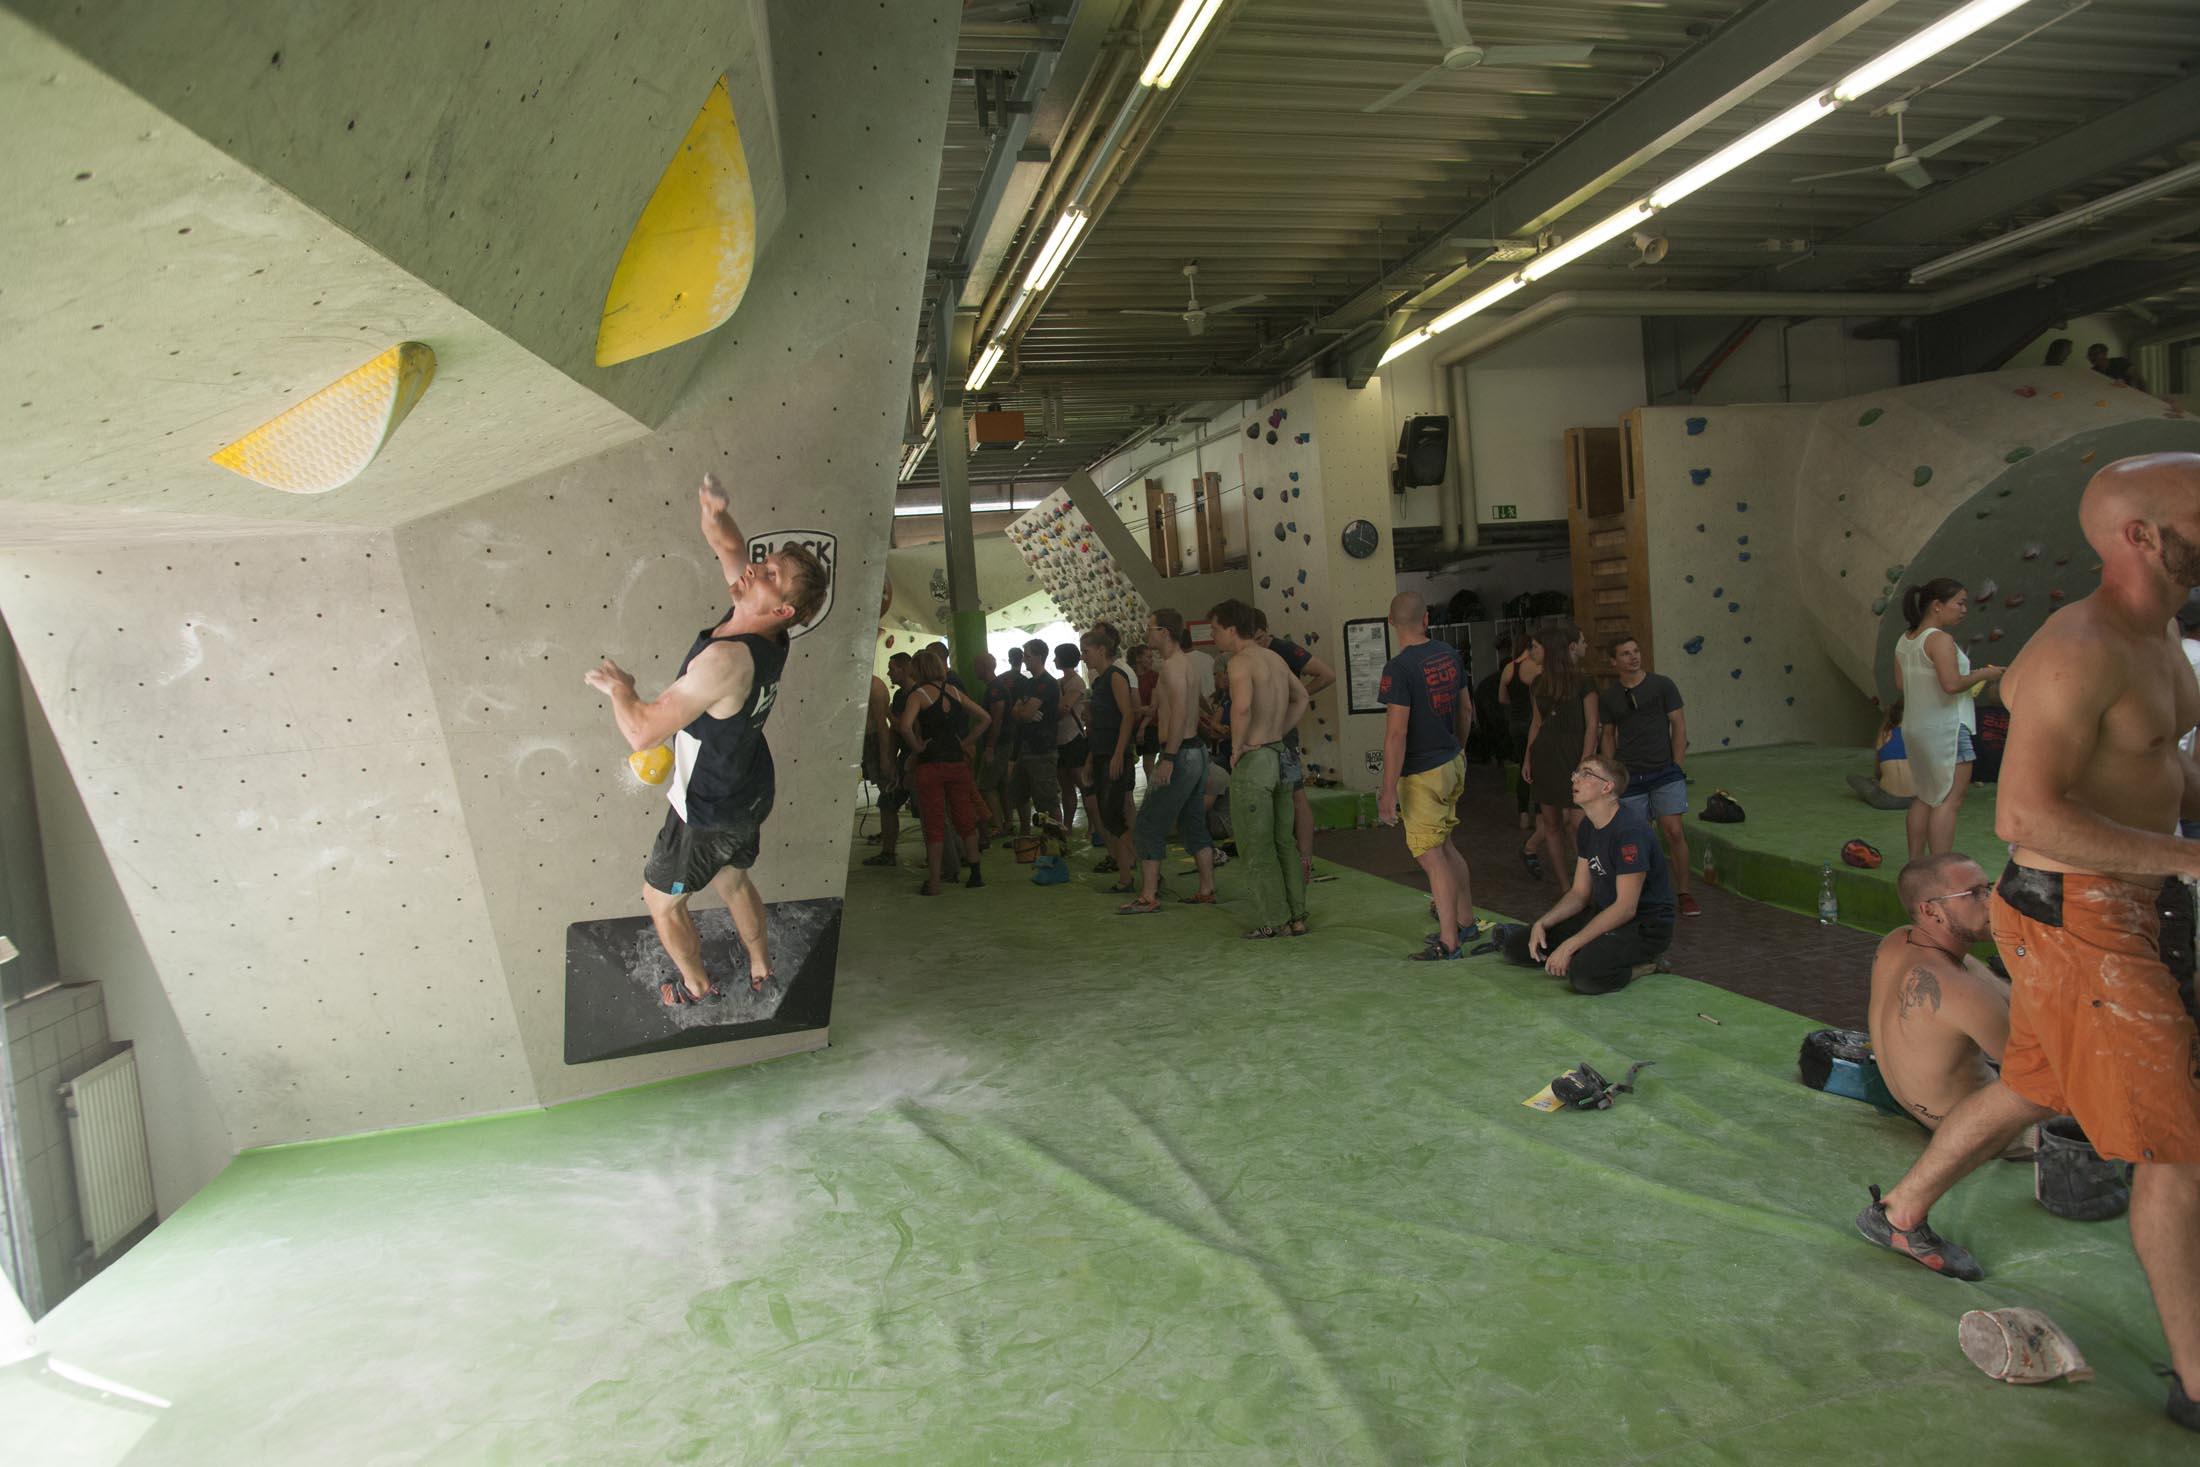 Quali, internationaler bouldercup Frankenjura 2016, BLOCKHELDEN Erlangen, Mammut, Bergfreunde.de, Boulderwettkampf07092016403